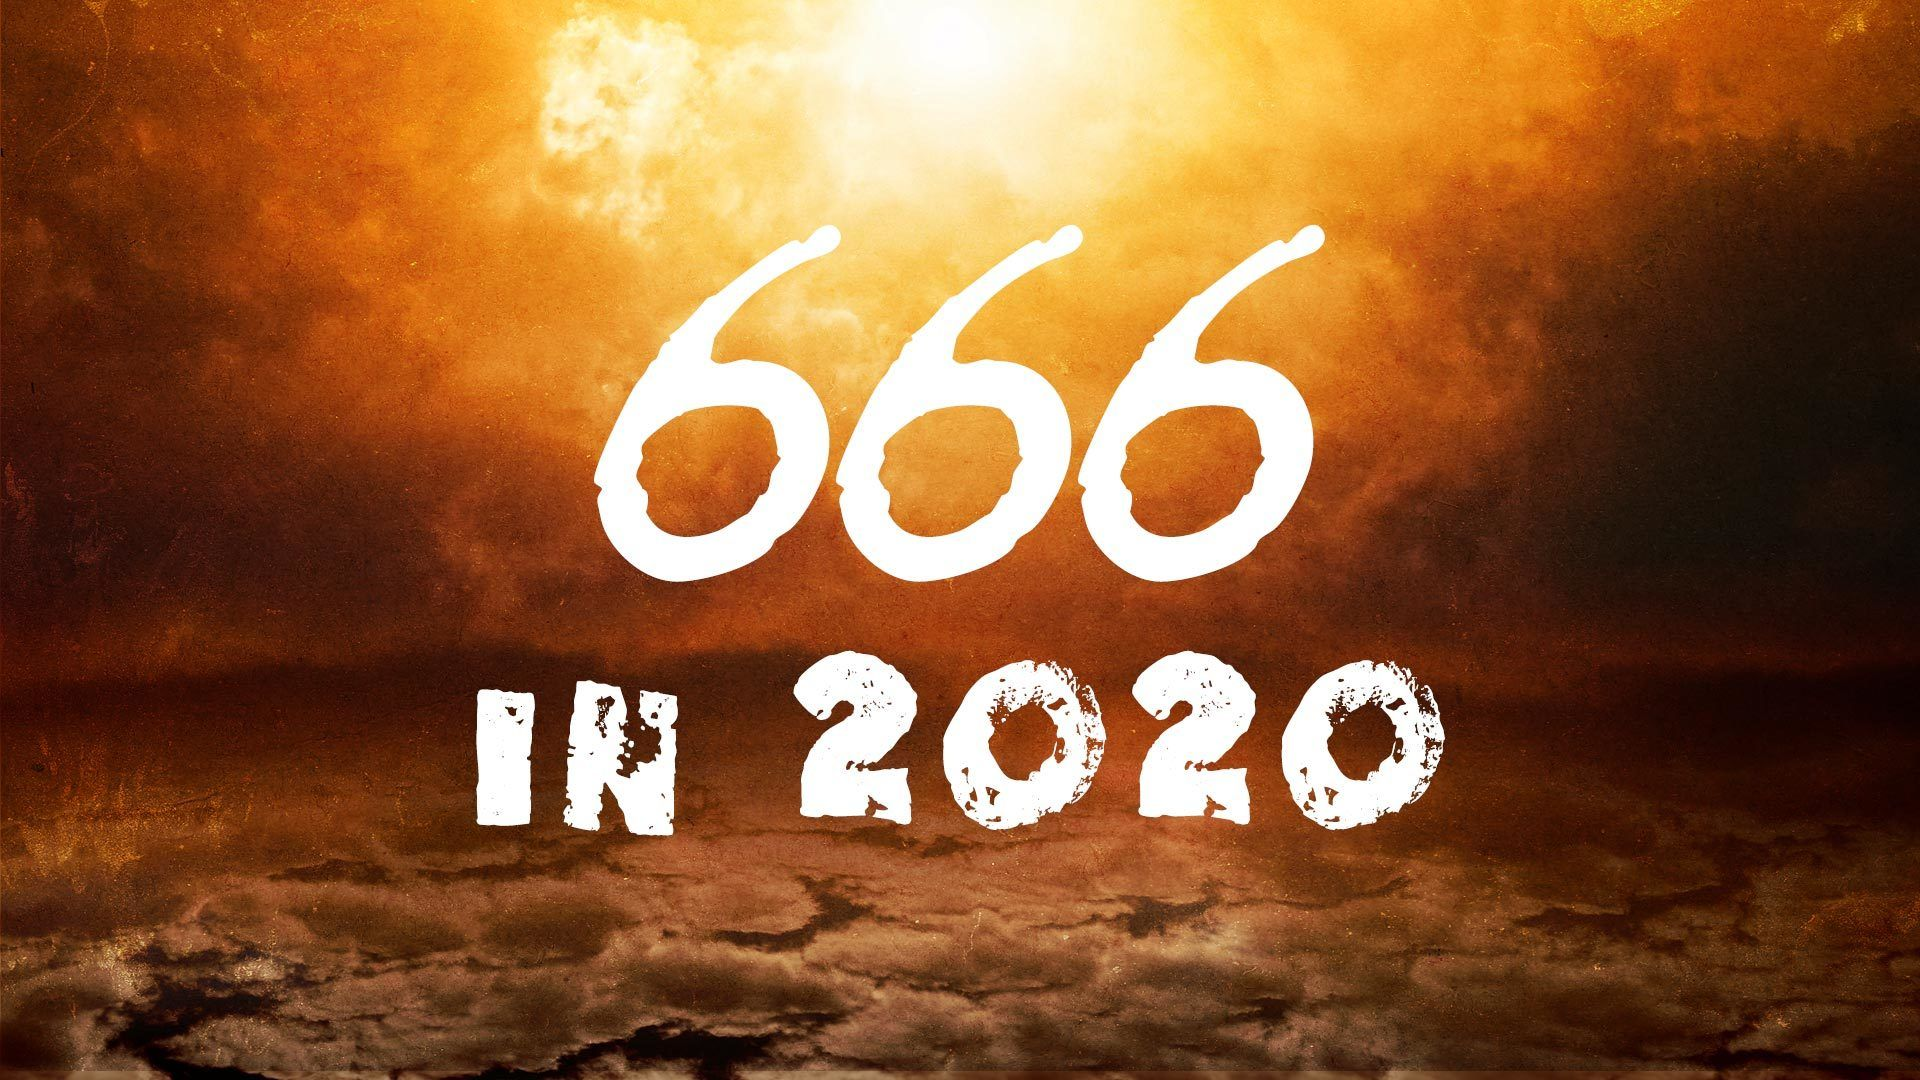 Ronald wilson reagan 666